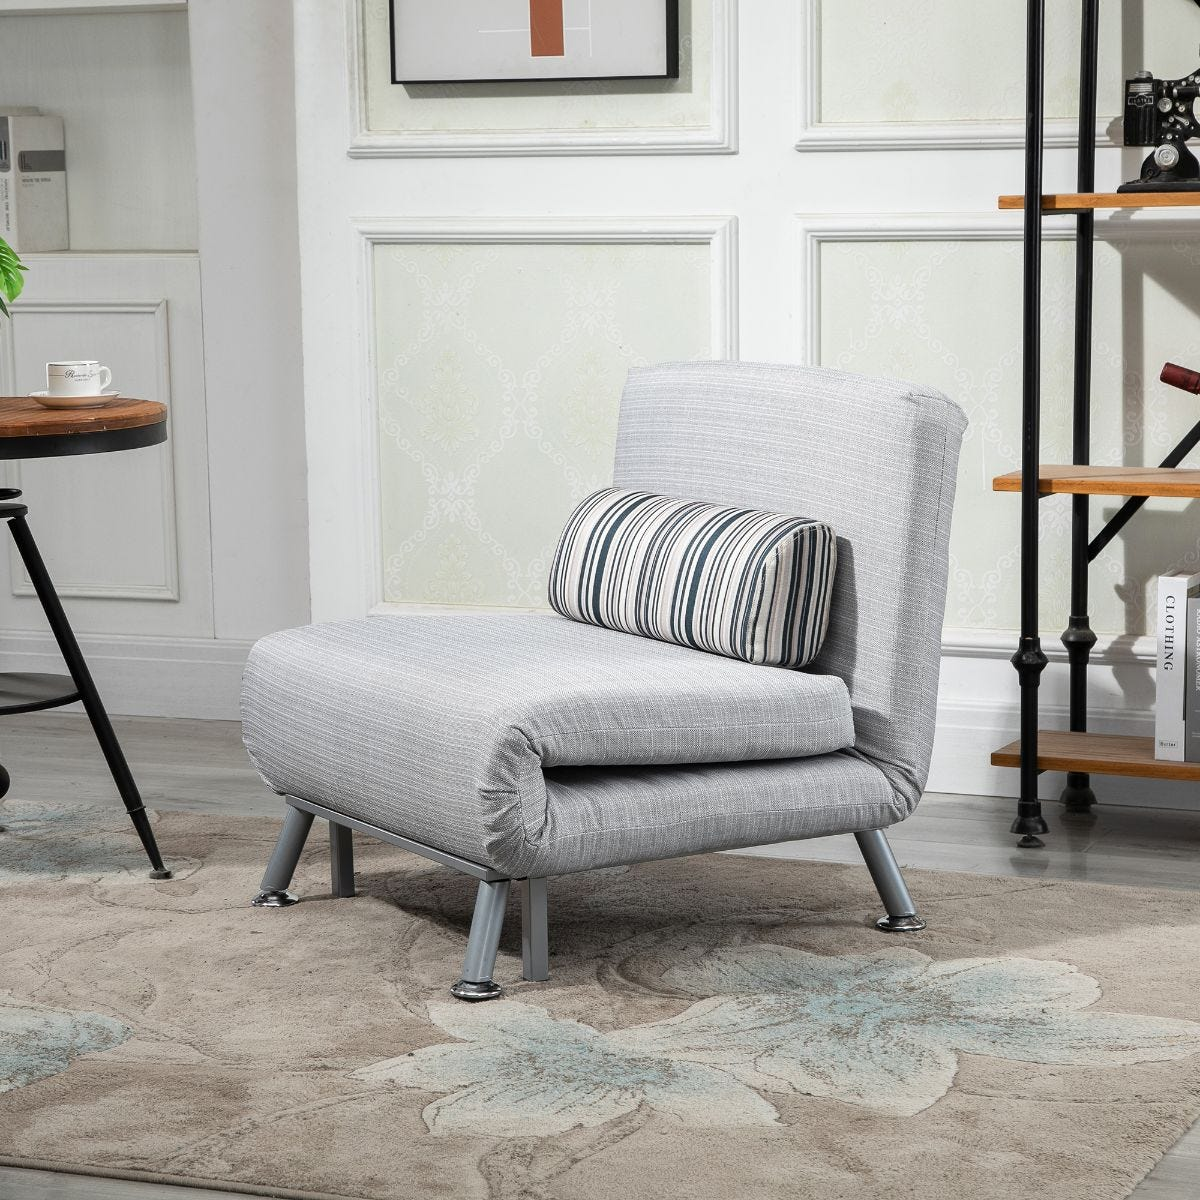 Single Folding 5 Position Steel Convertible Futon Sleeper Chair Sofa Bed Grey